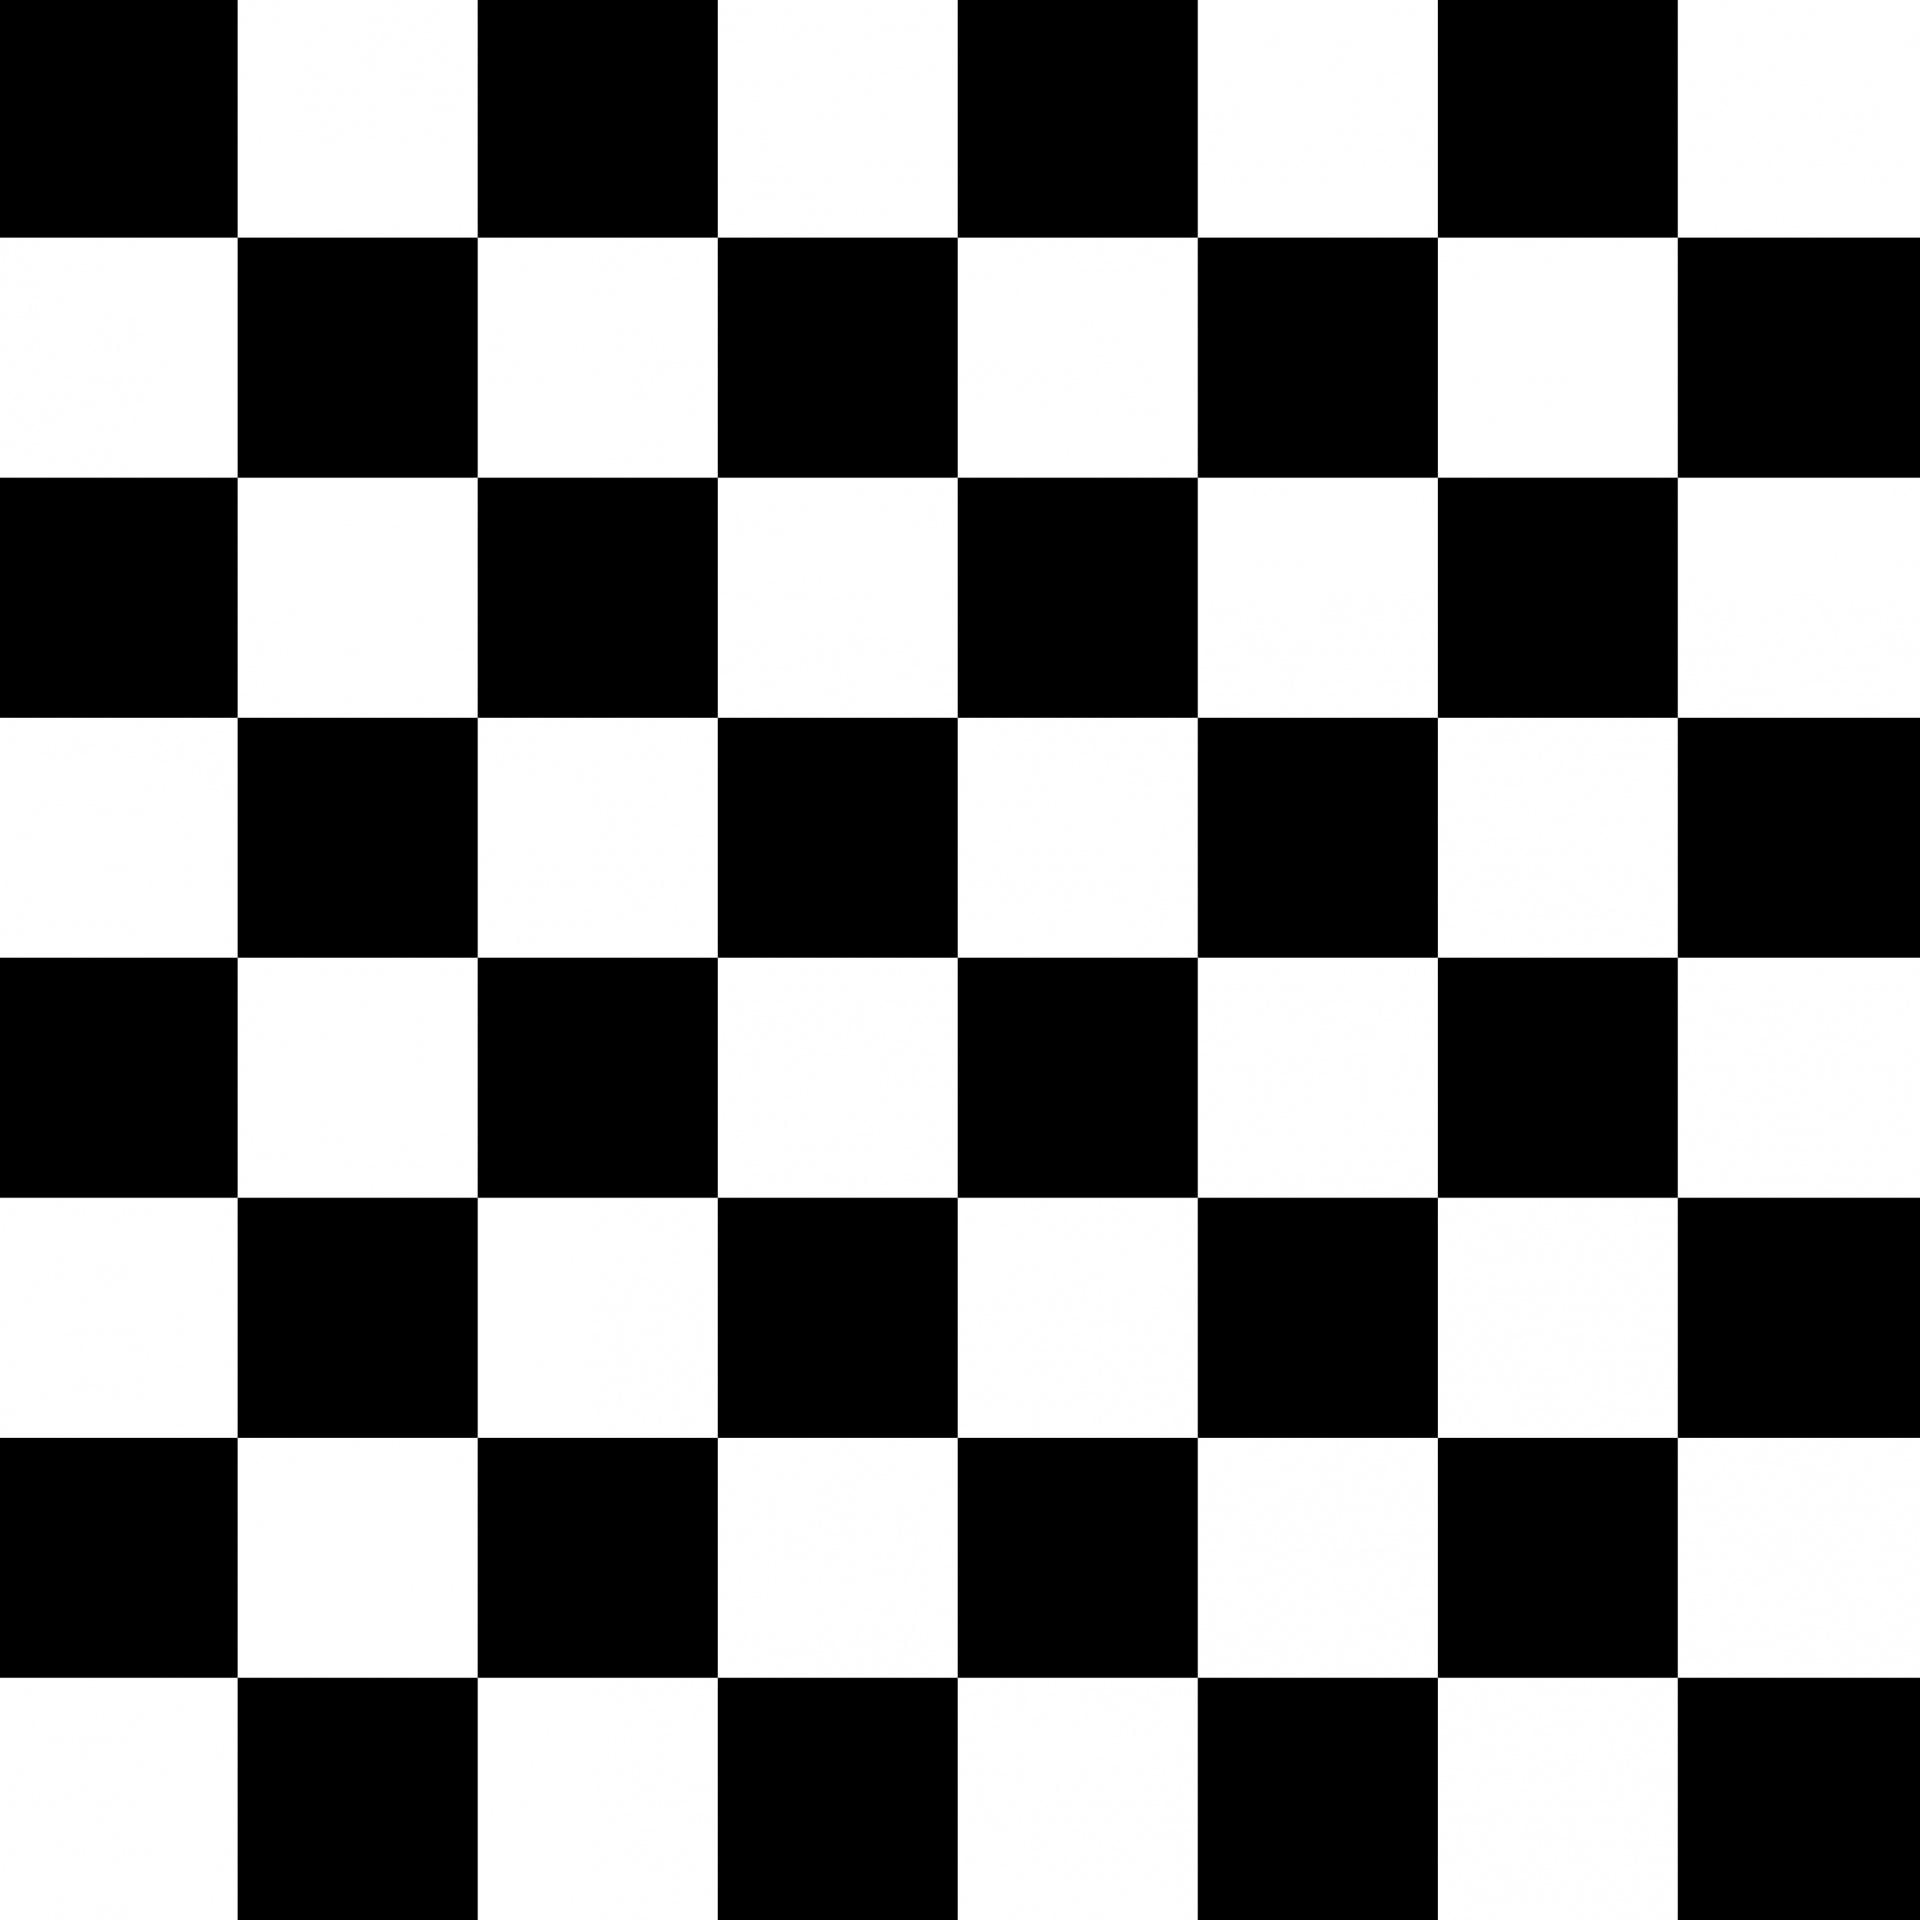 Tile Tiles Tiling Wallpaper Paper